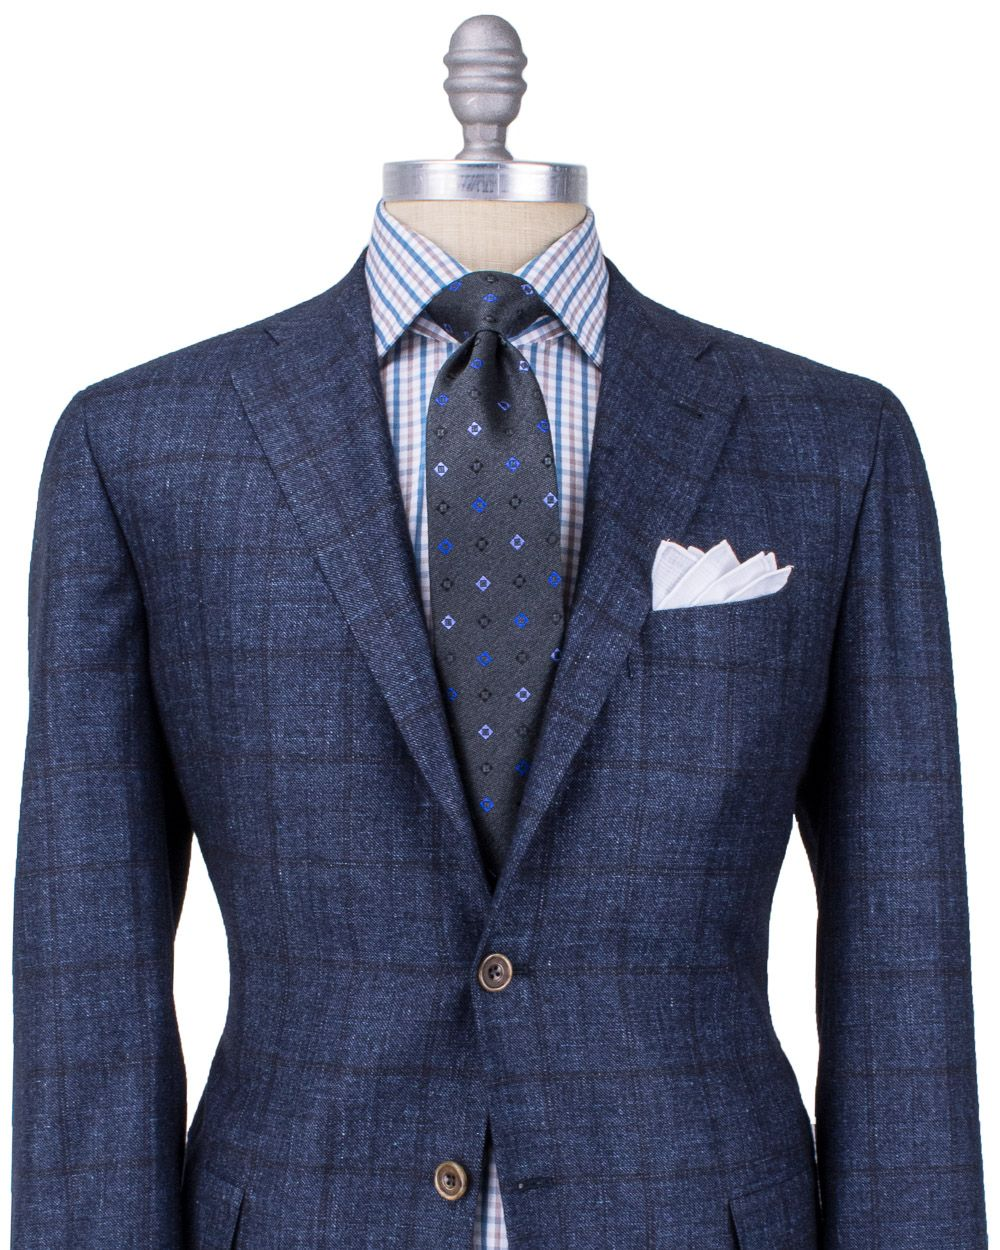 Kiton navy windowpane suit plaid shirt polka dot necktie for Navy suit checkered shirt